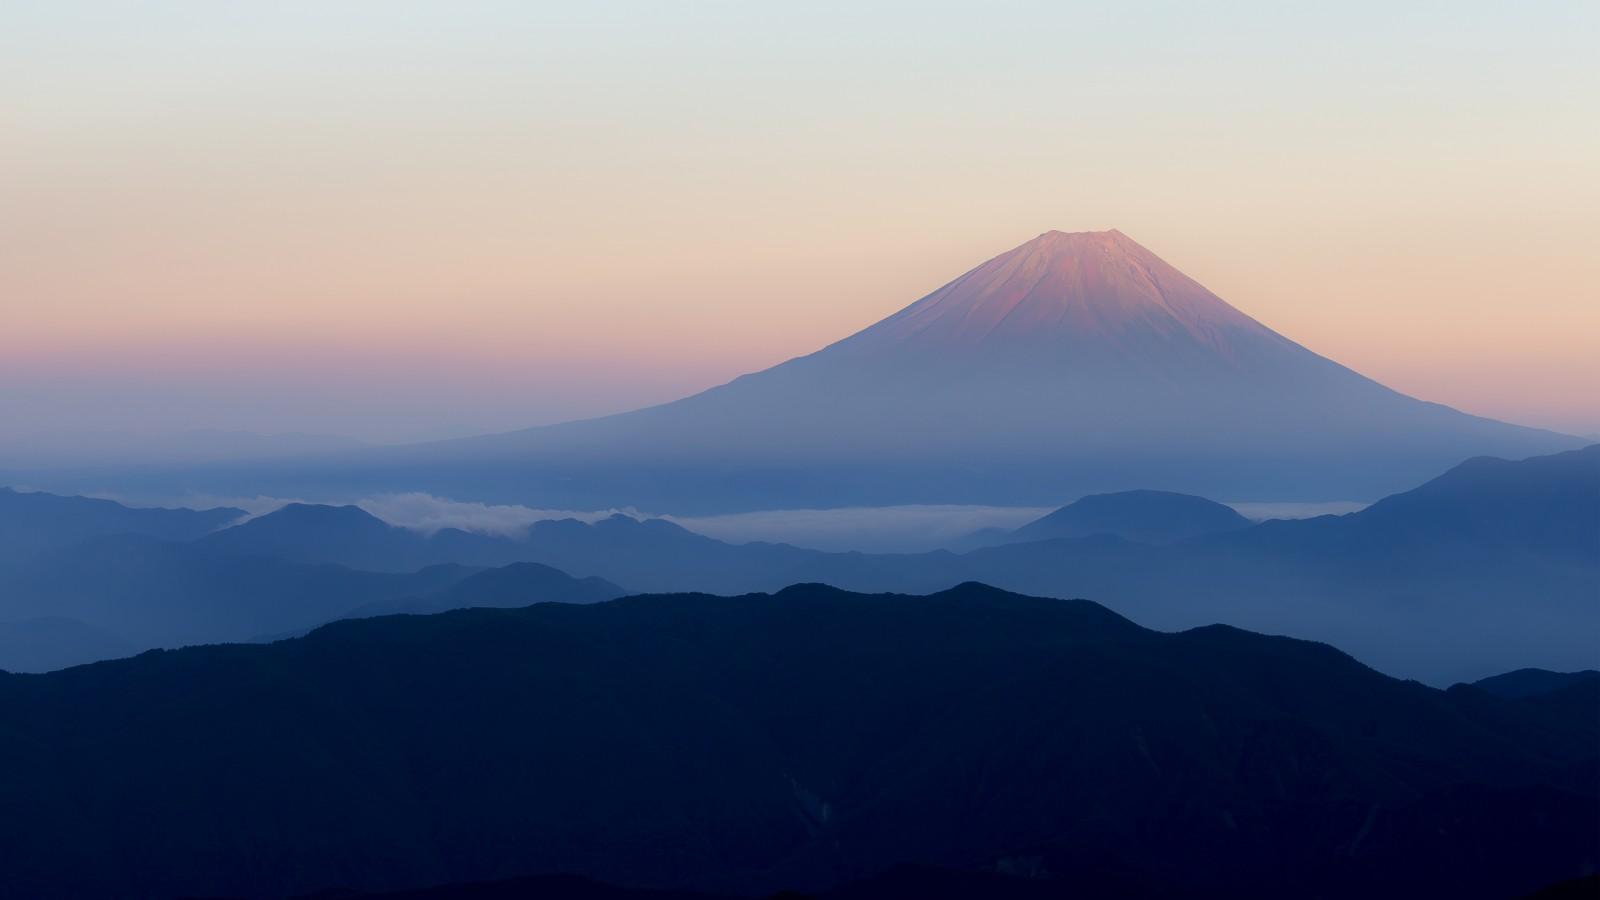 Mount Fuji Japan 4k Wallpaper - Kataoka Jewelry And Objets D'art , HD Wallpaper & Backgrounds